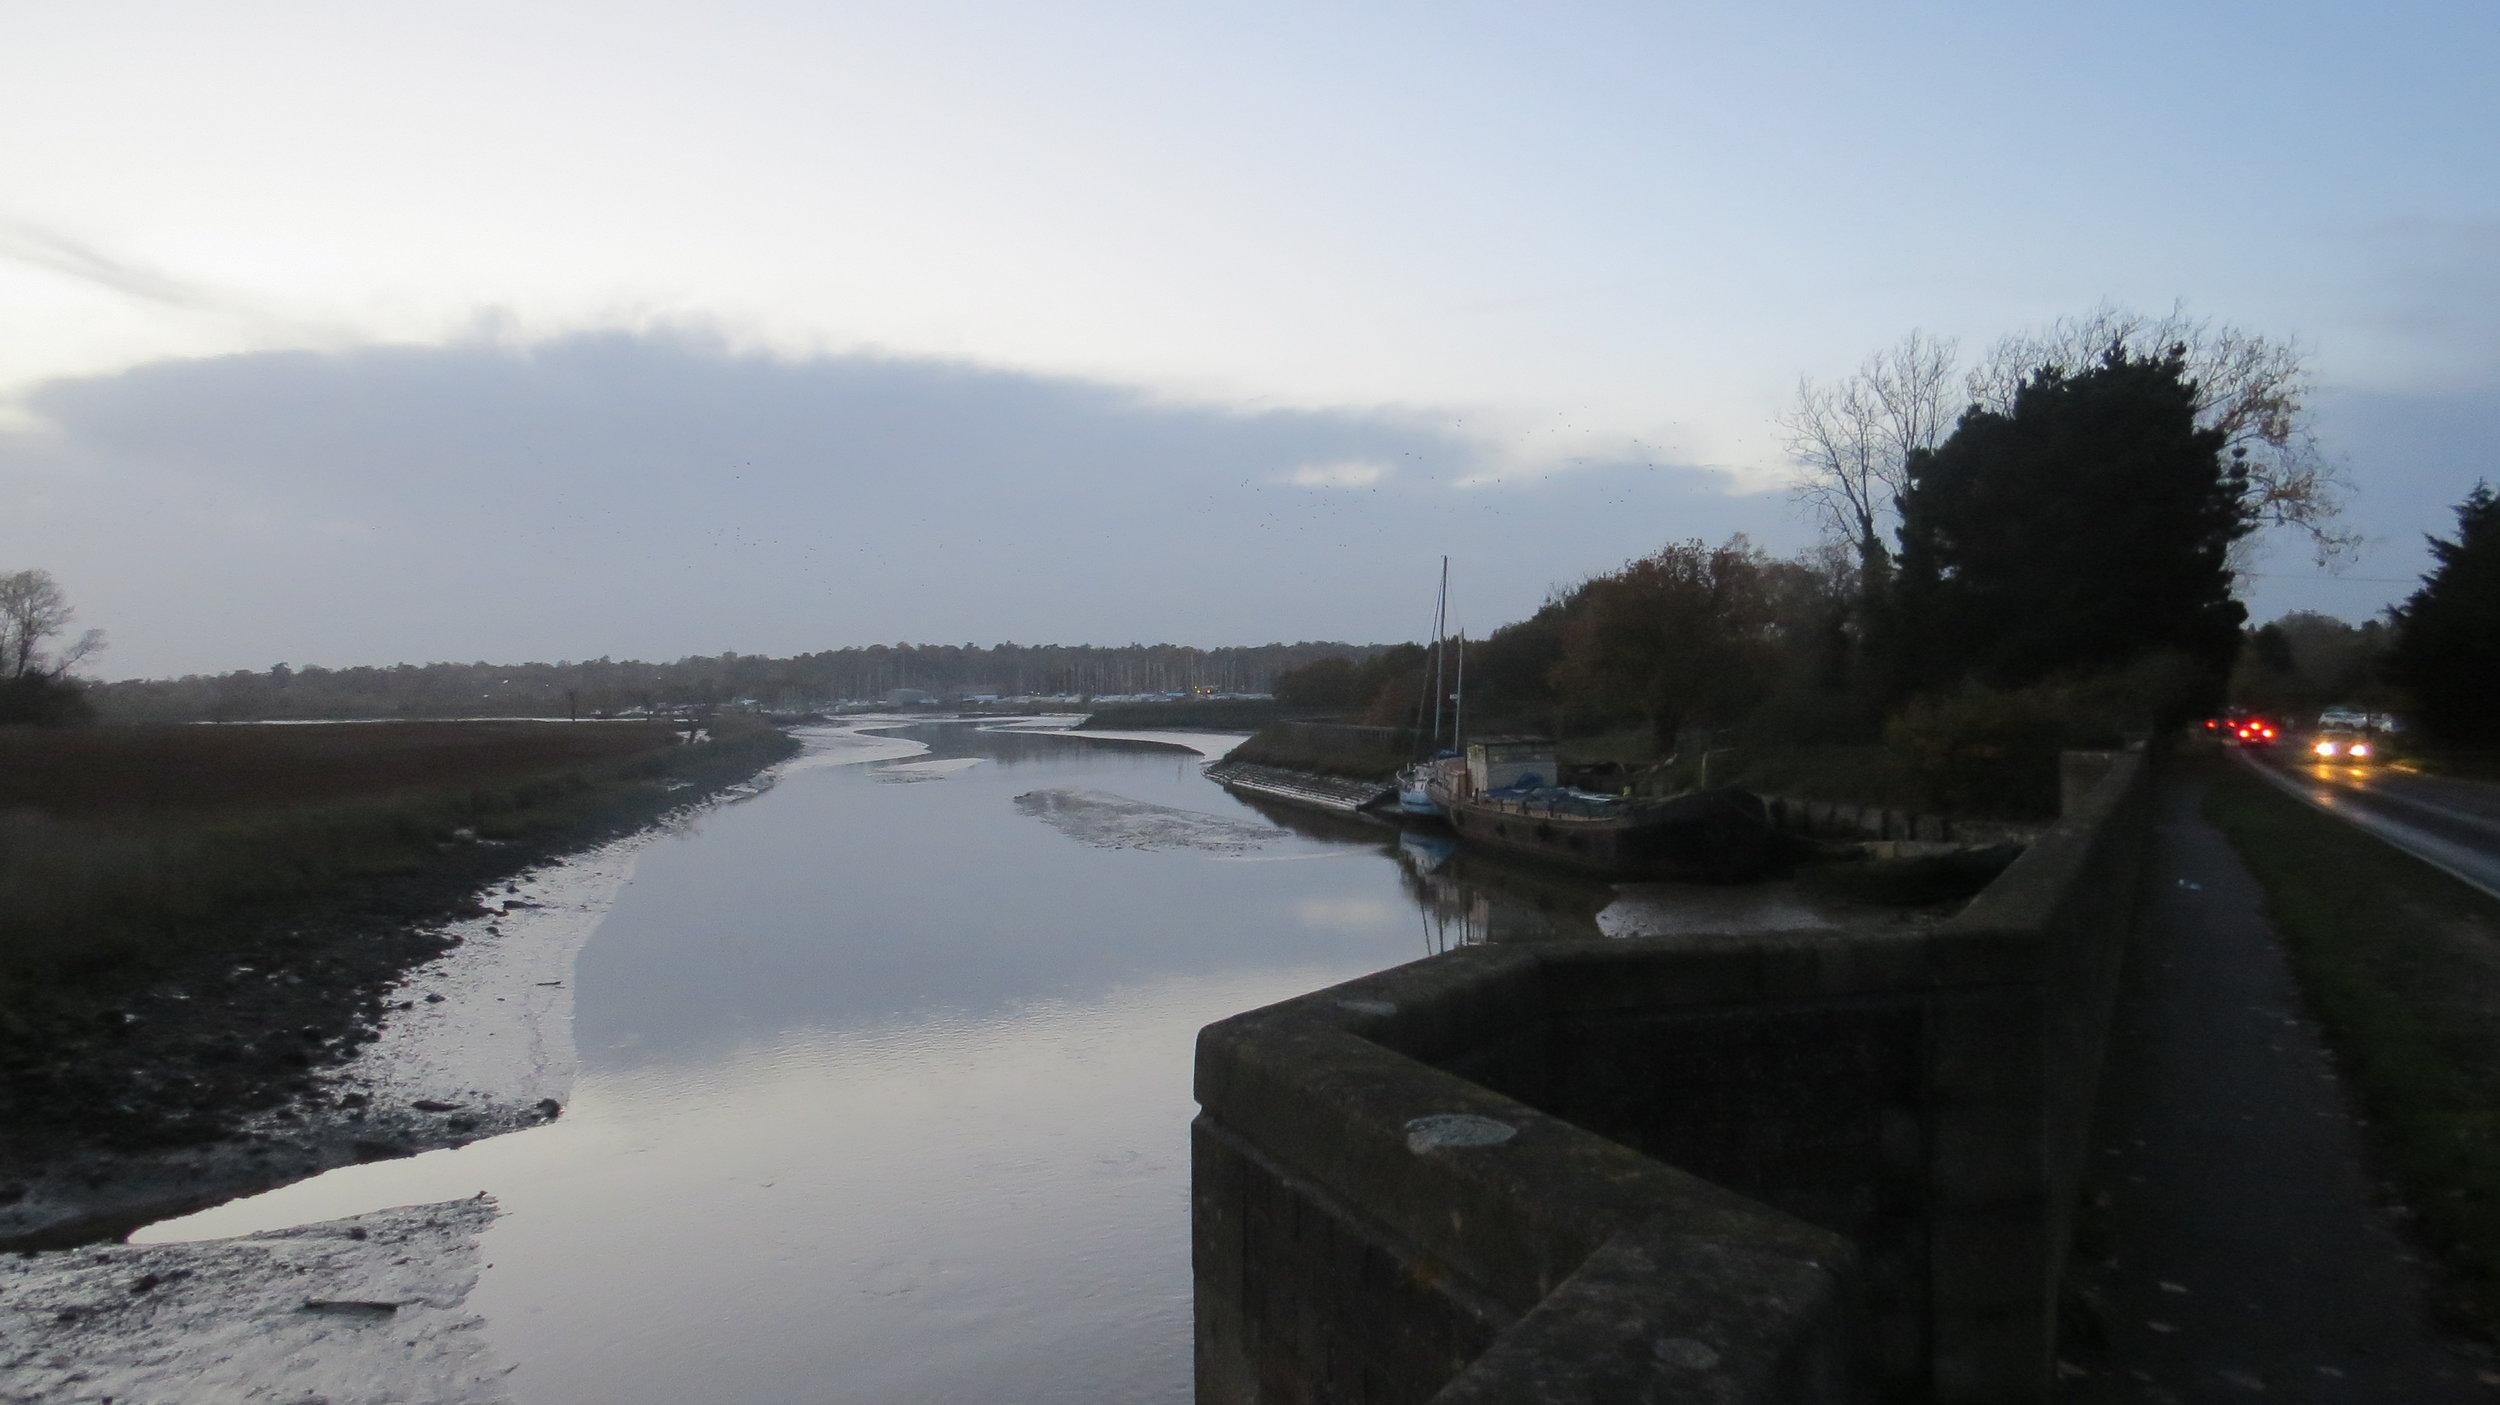 Crossing the Wilford Bridge